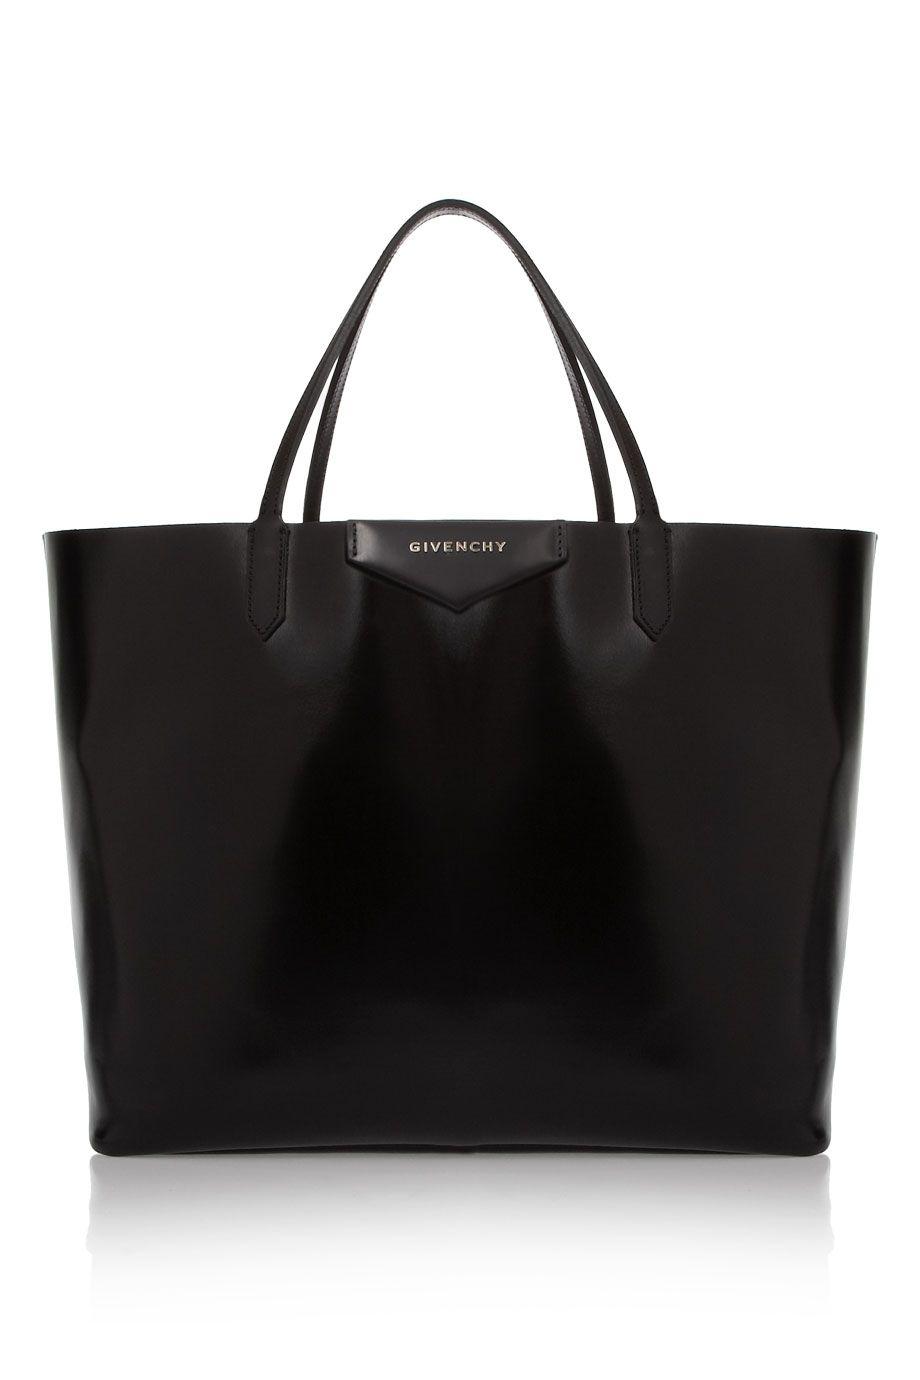 classic shopper tote - Black Givenchy JBFRshy1